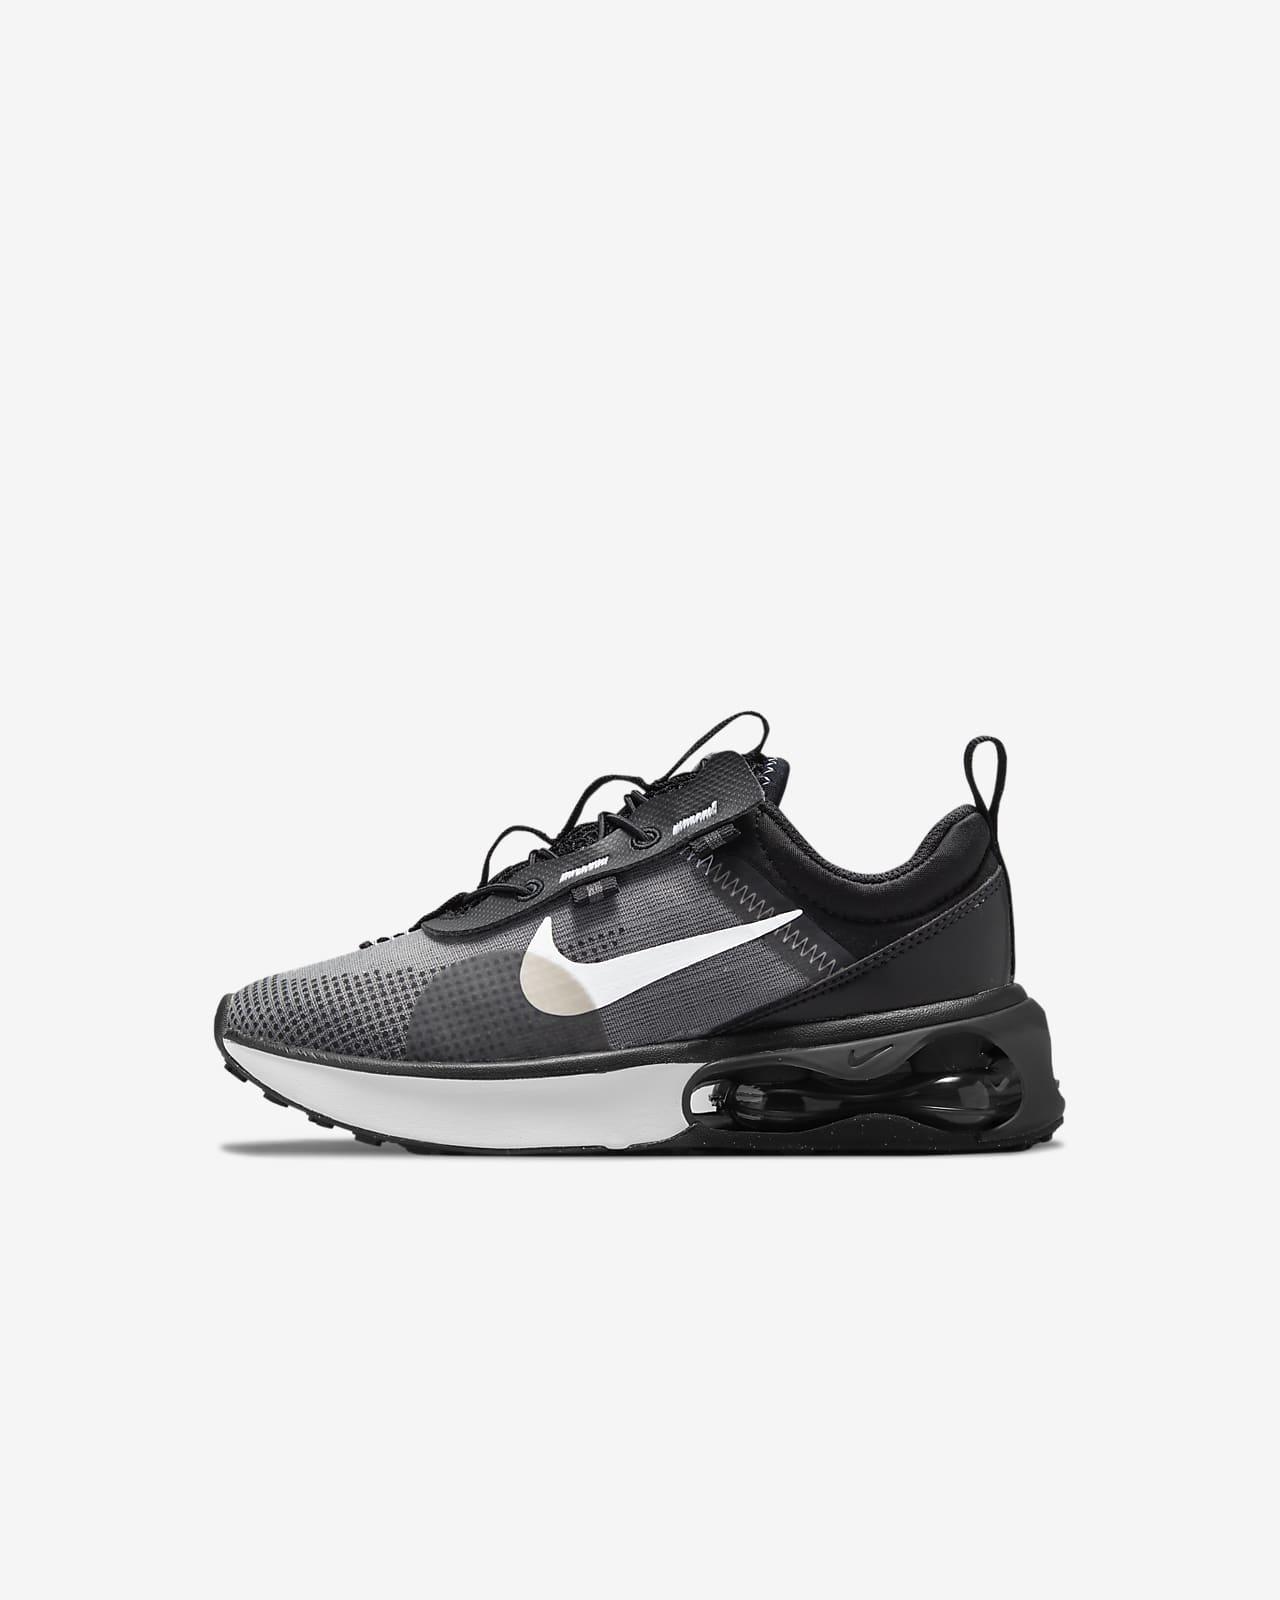 Nike Air Max2021 Zapatillas - Niño/a pequeño/a